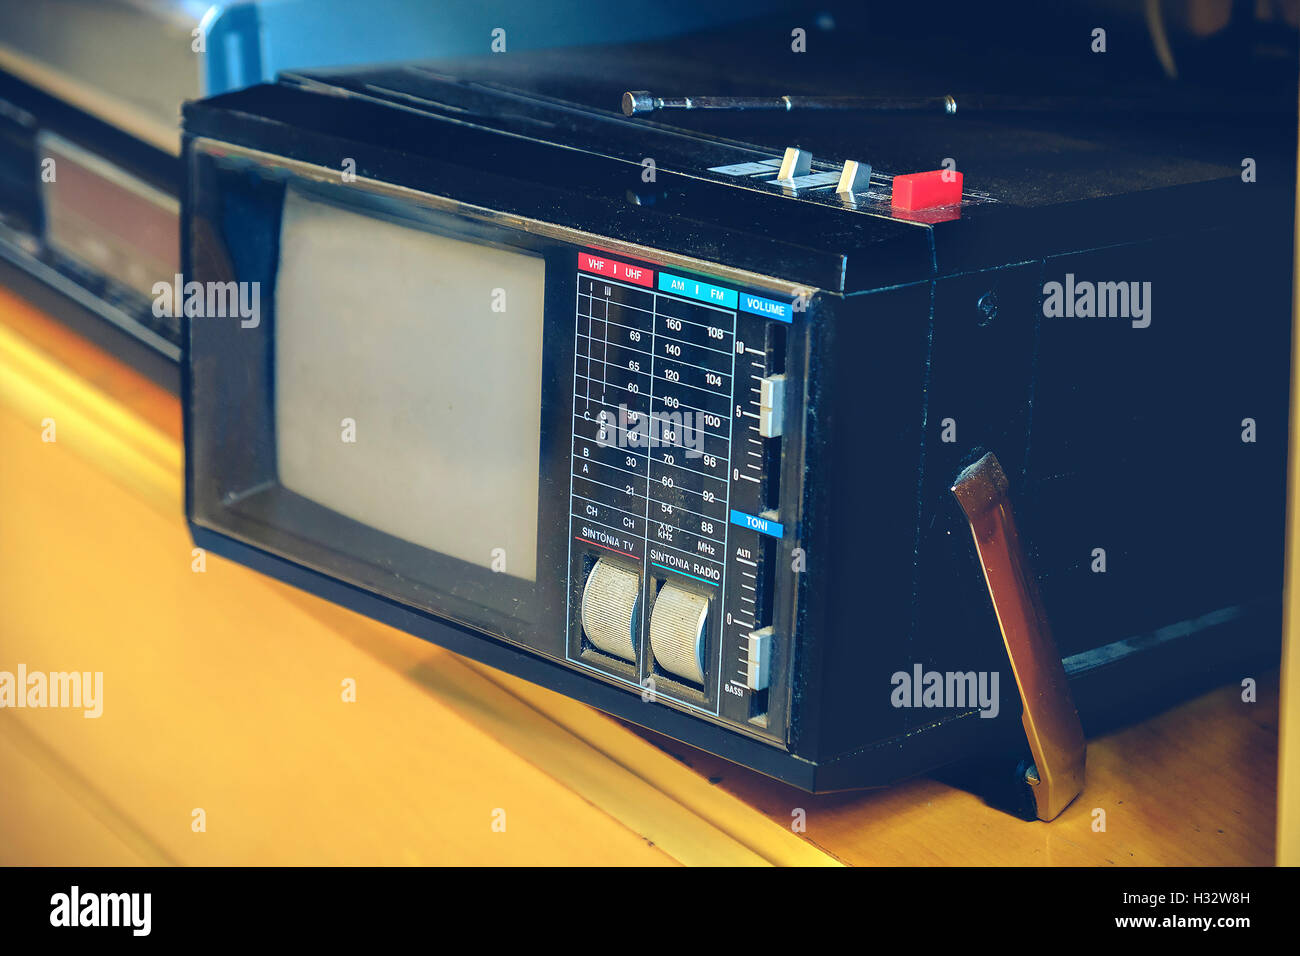 portable tv old retro vintage background - Stock Image